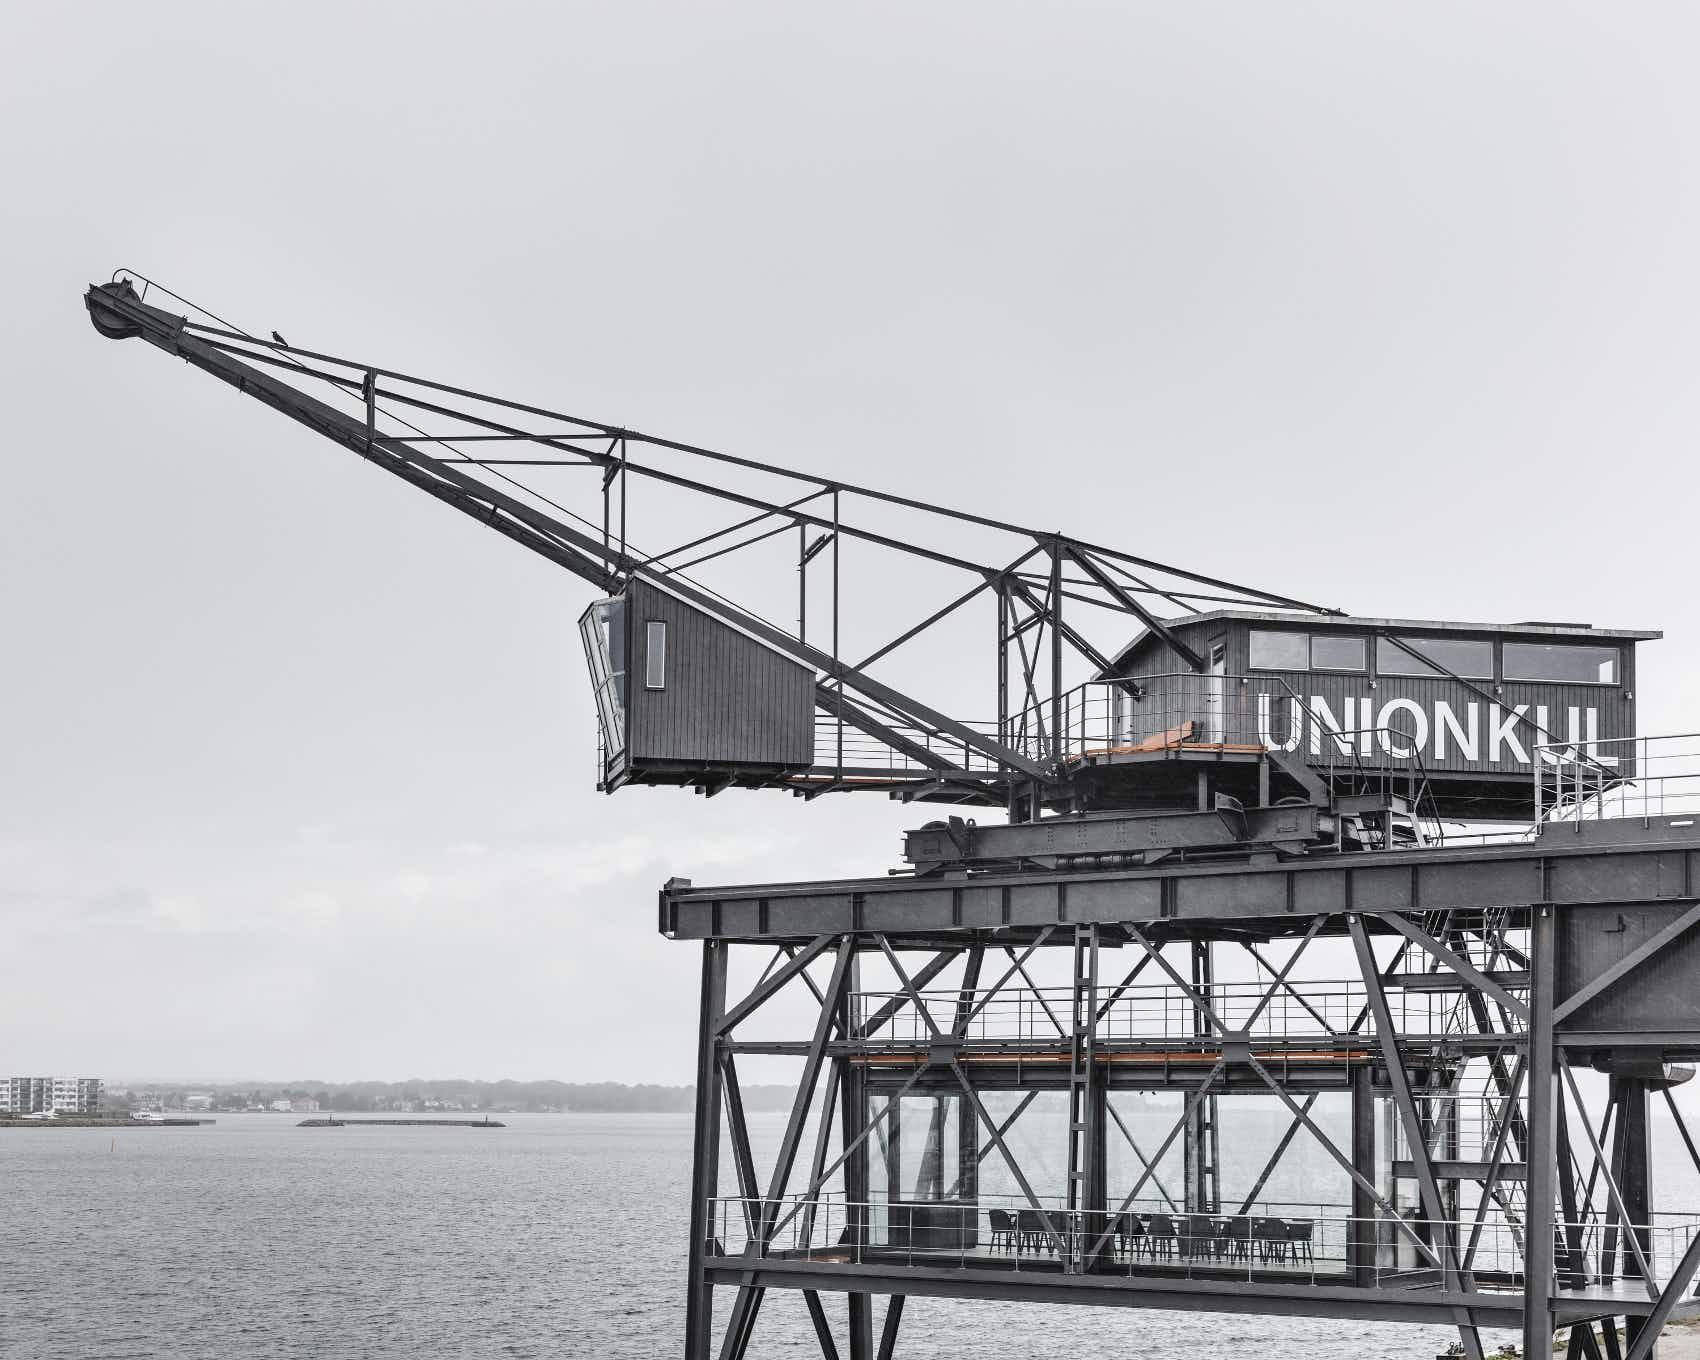 A luxury retreat has opened in a coal crane suspended over the Copenhagen docks